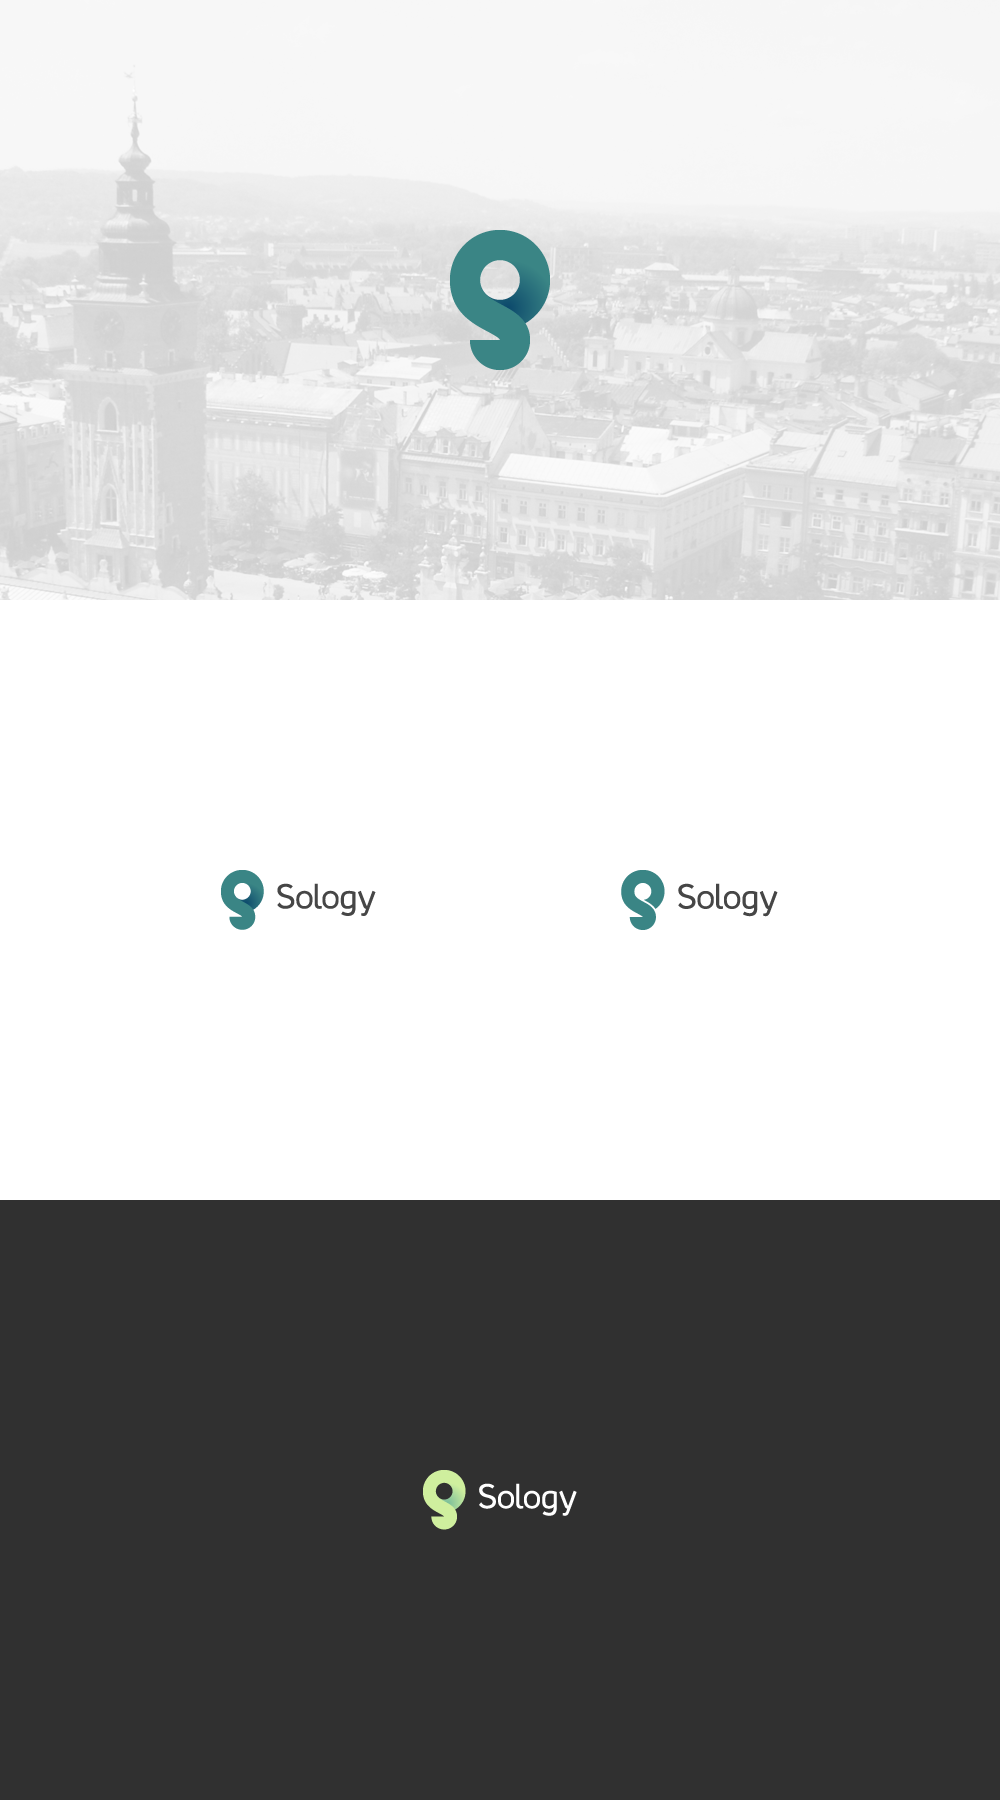 Sology logo